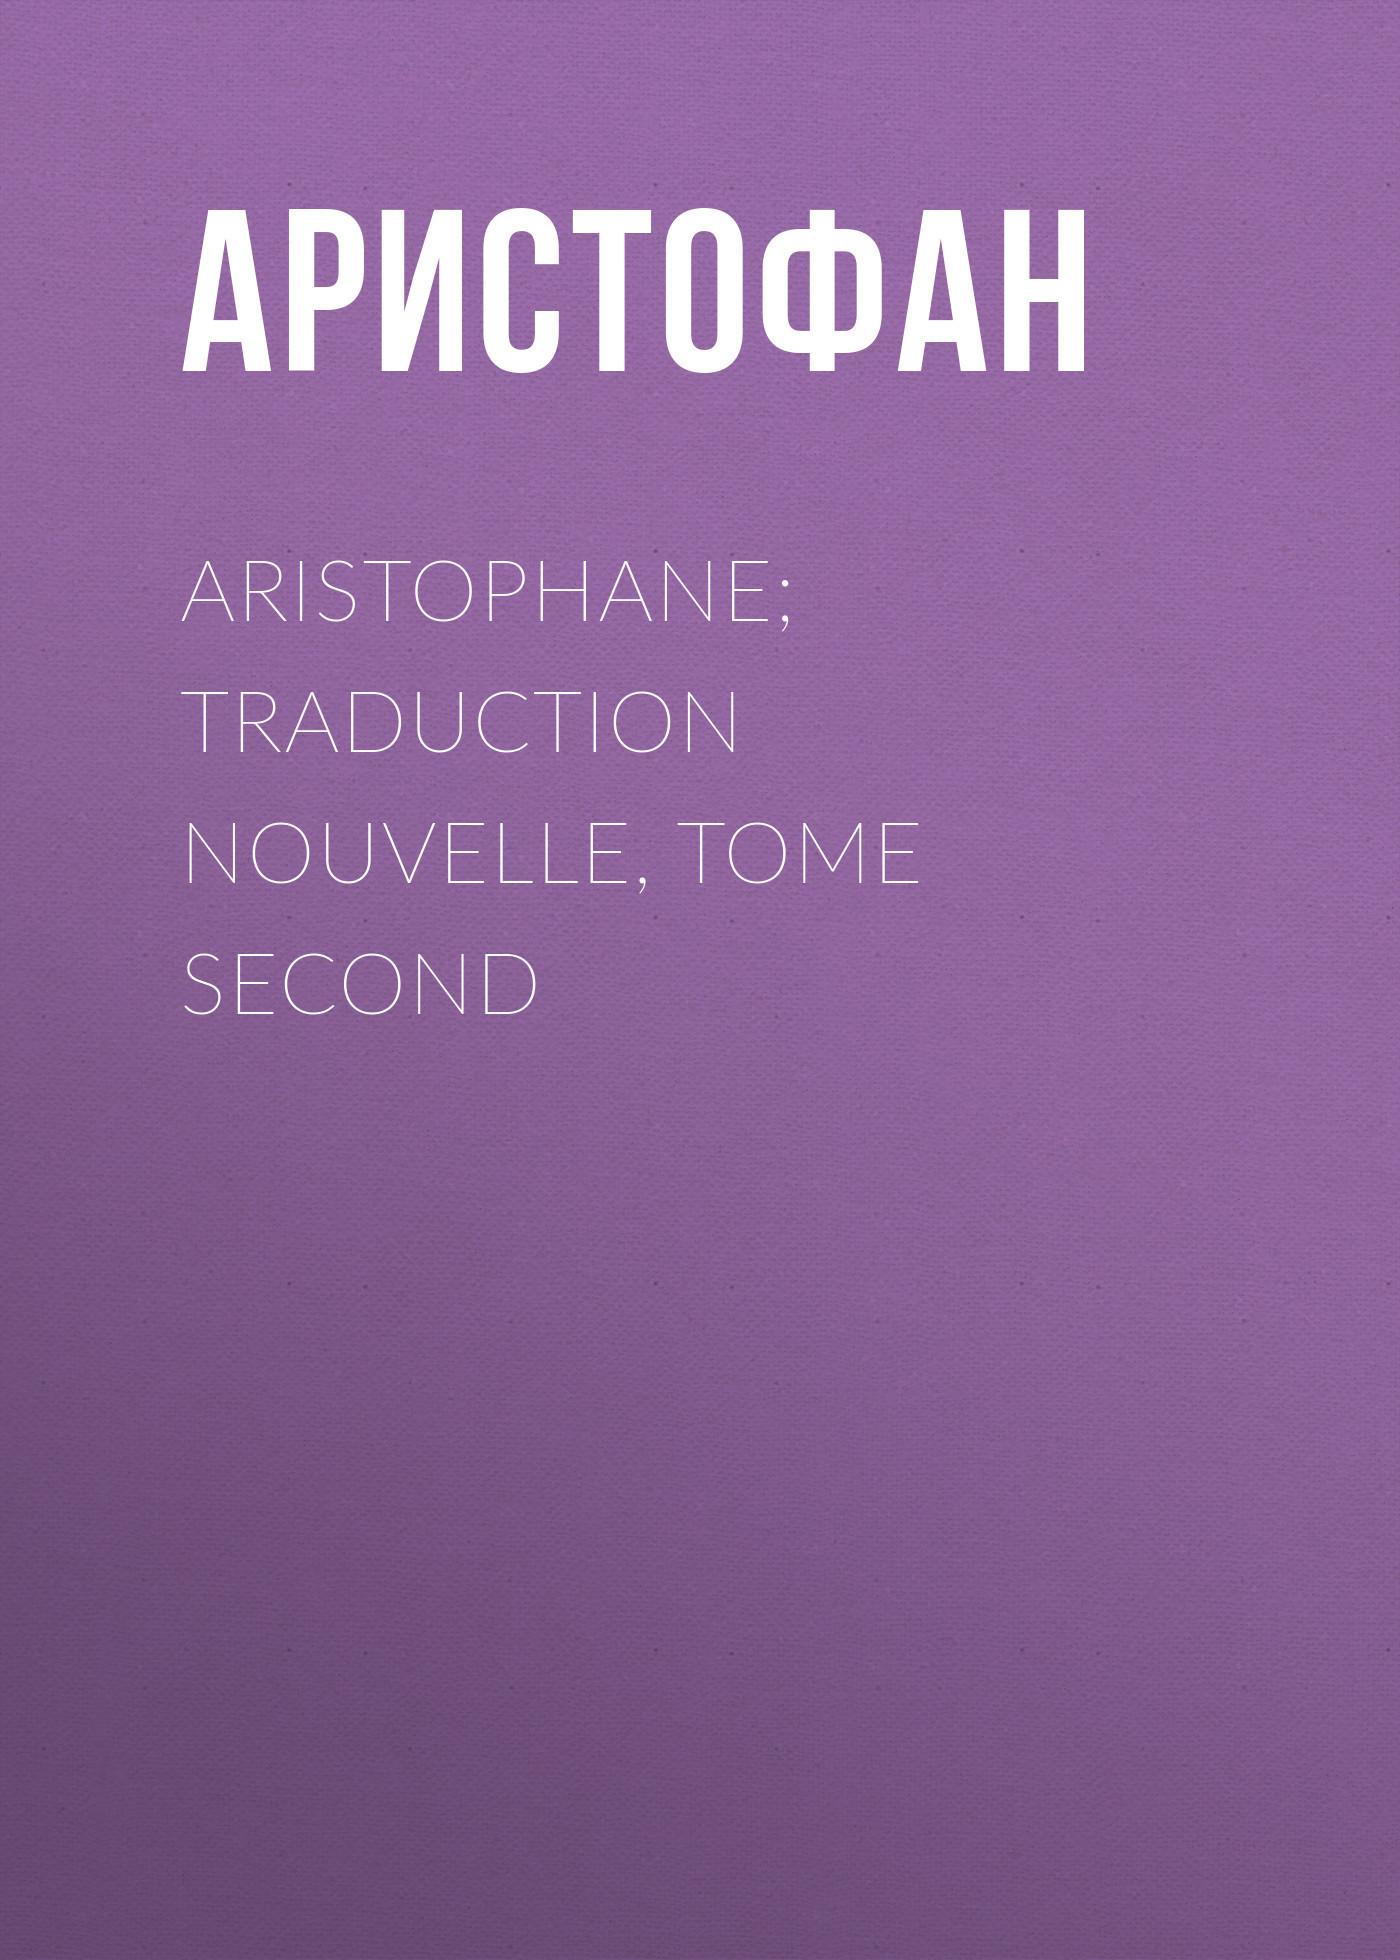 Аристофан Aristophane; Traduction nouvelle, tome second